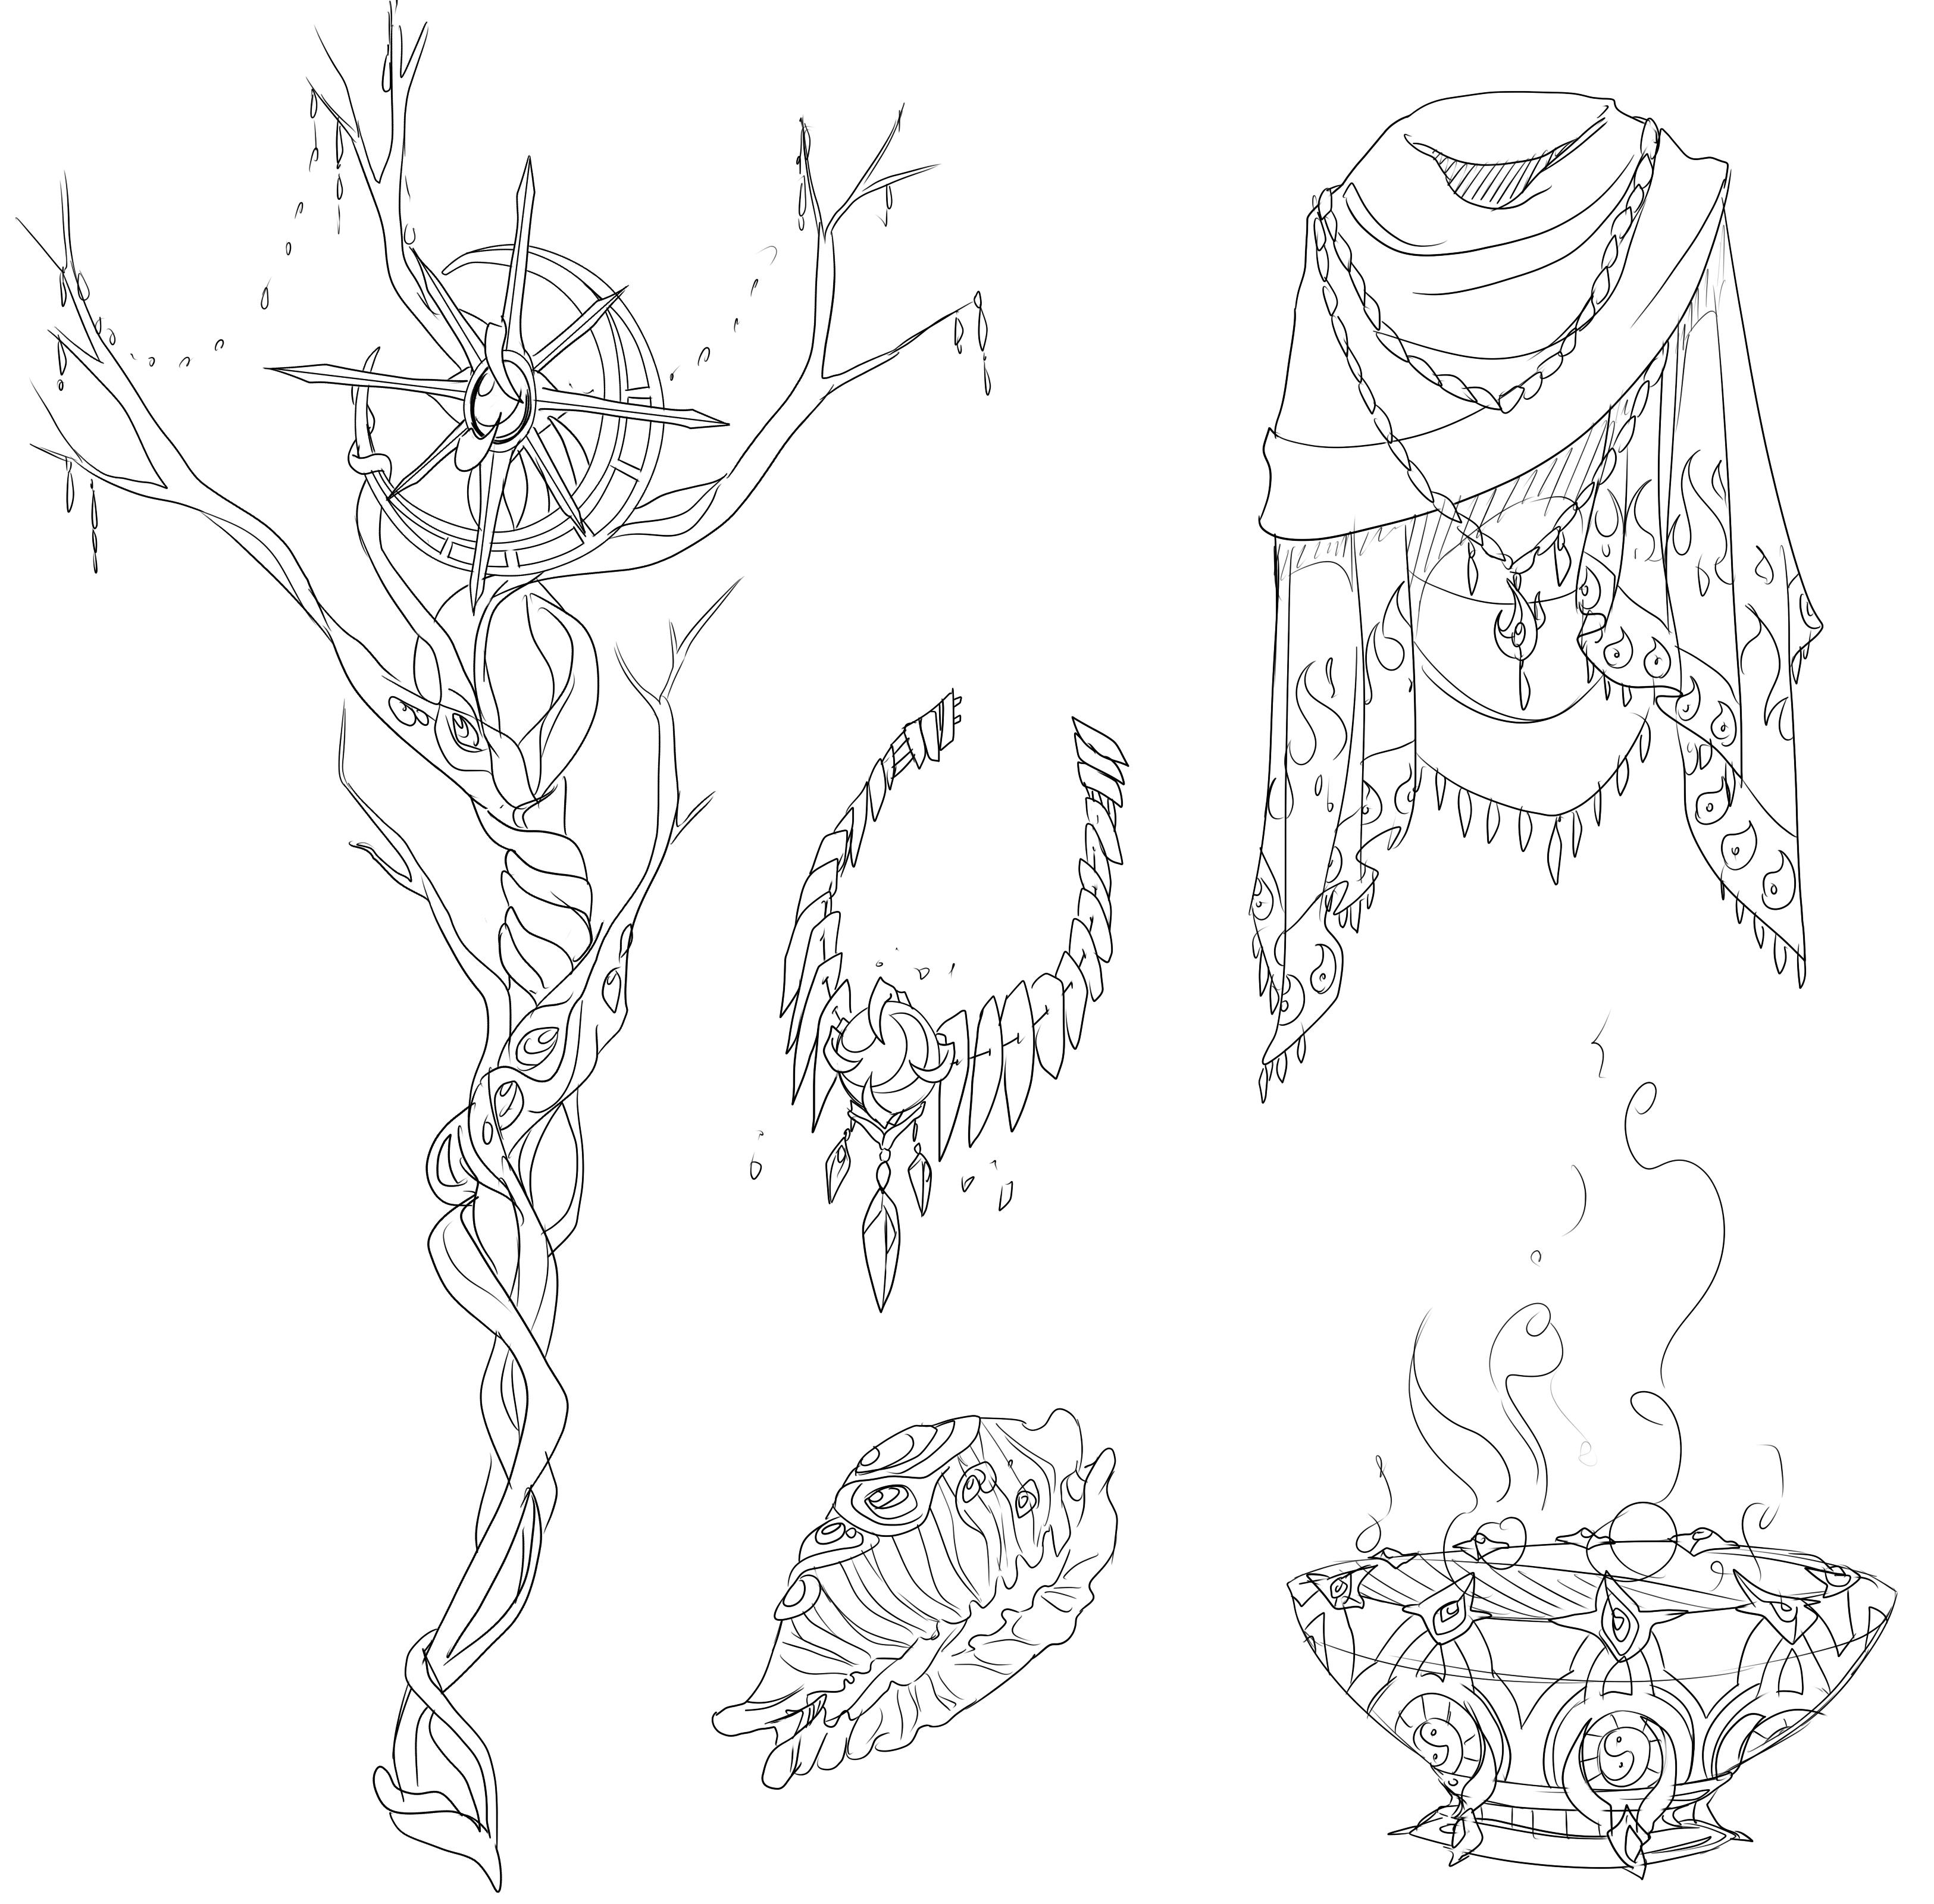 Kaguya's five items - concept art by FireEagleSpirit